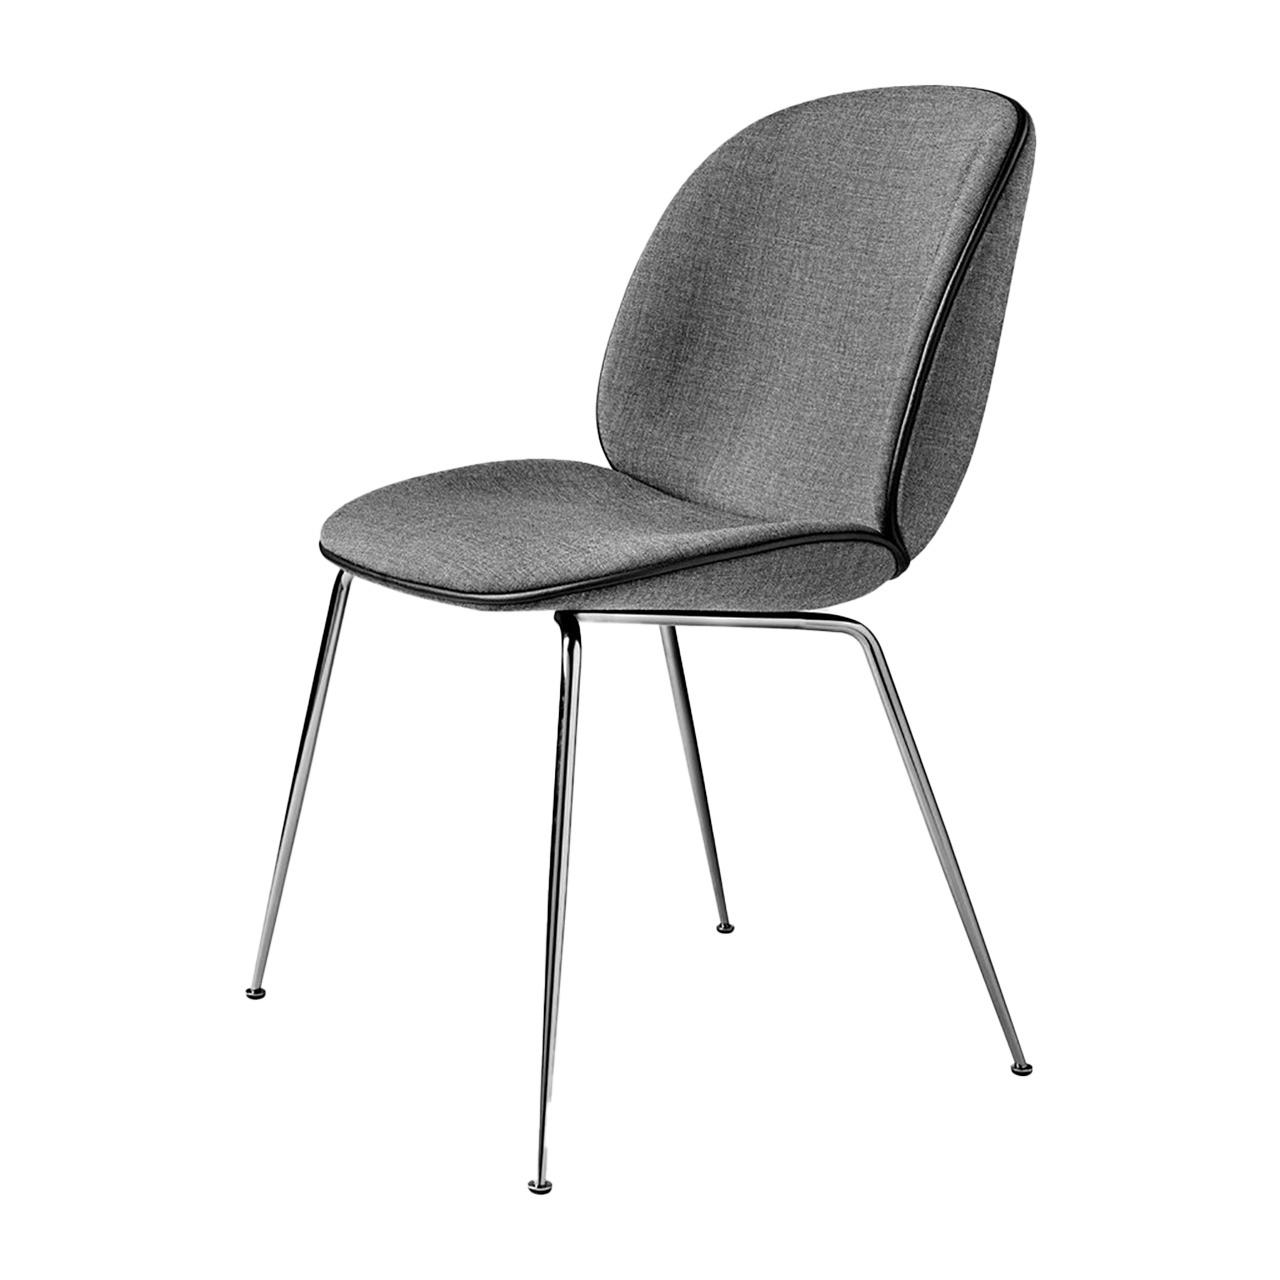 Stuhl Beetle Dining Chair Gubi